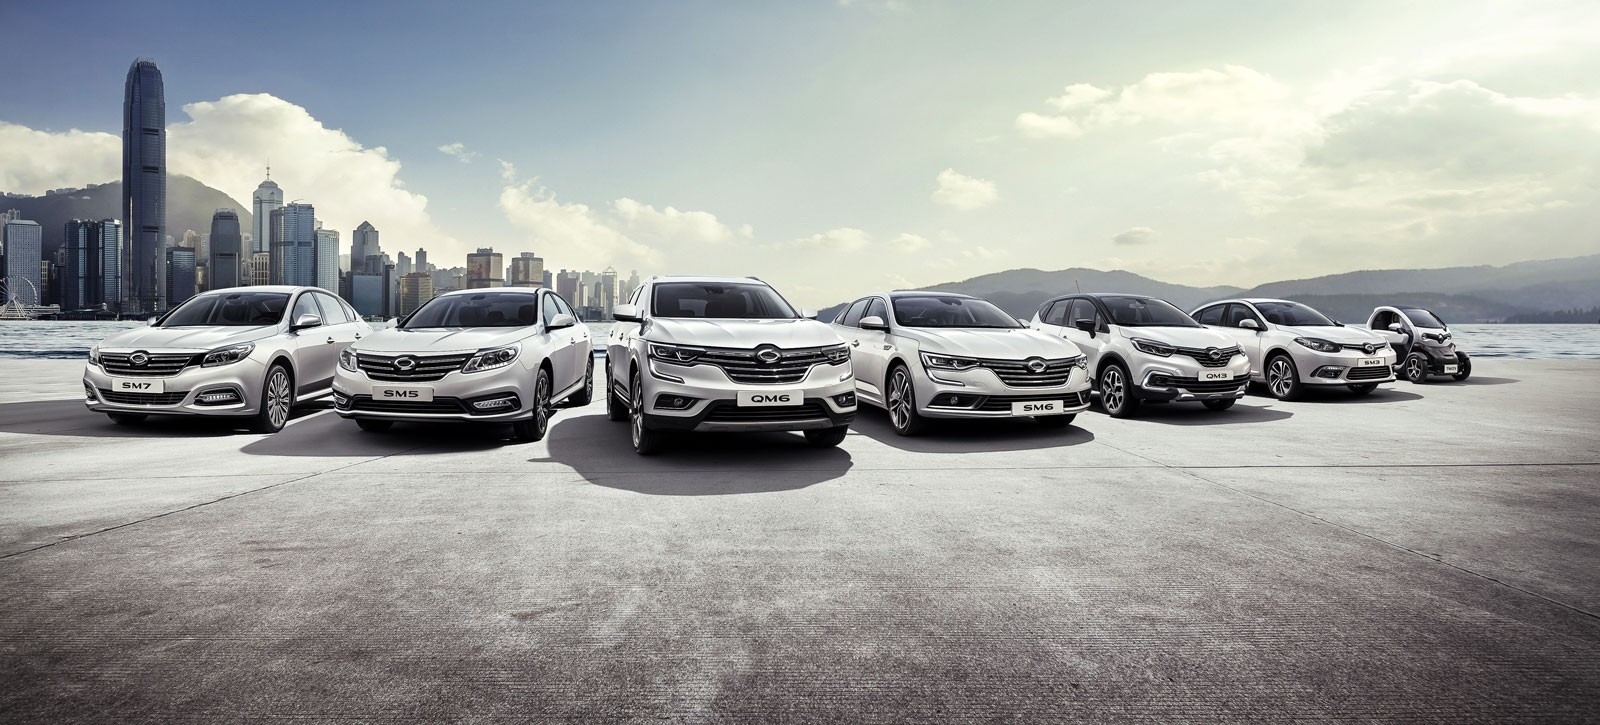 Renault Samsung Motors | LinkedIn